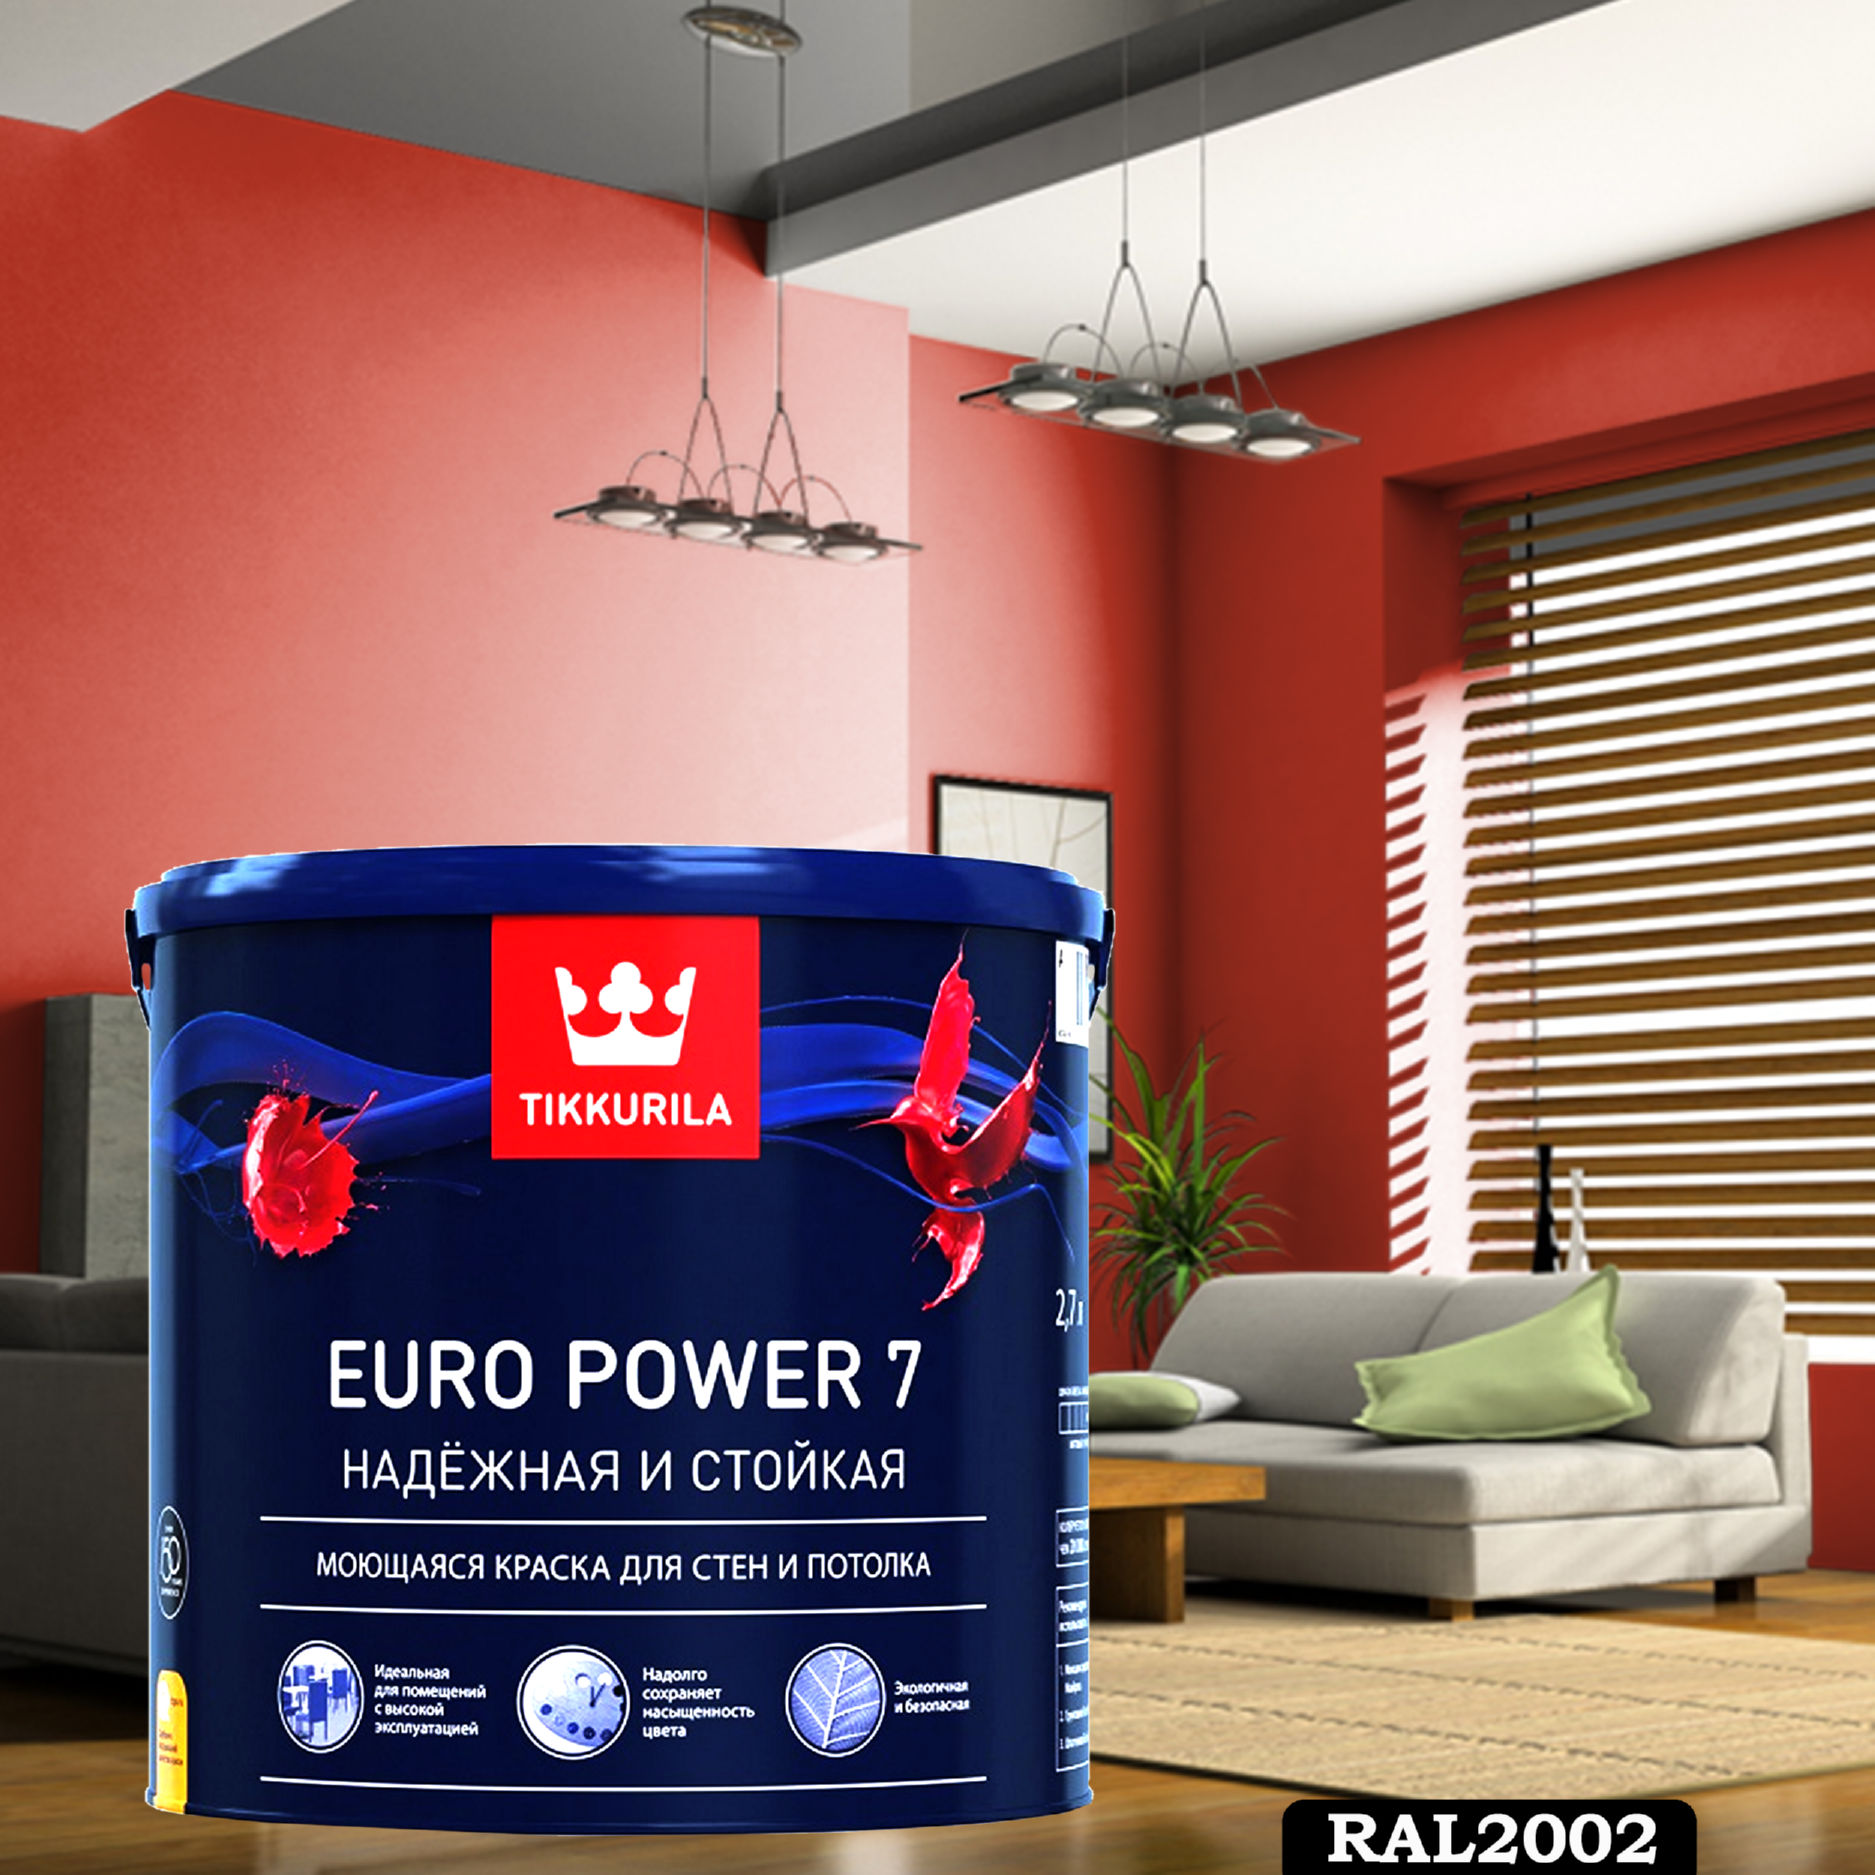 Фото 3 - Краска TIKKURILA Euro Power 7,  RAL 2002 Алый, латексная моющаяся матовая интерьерная, 9 л.